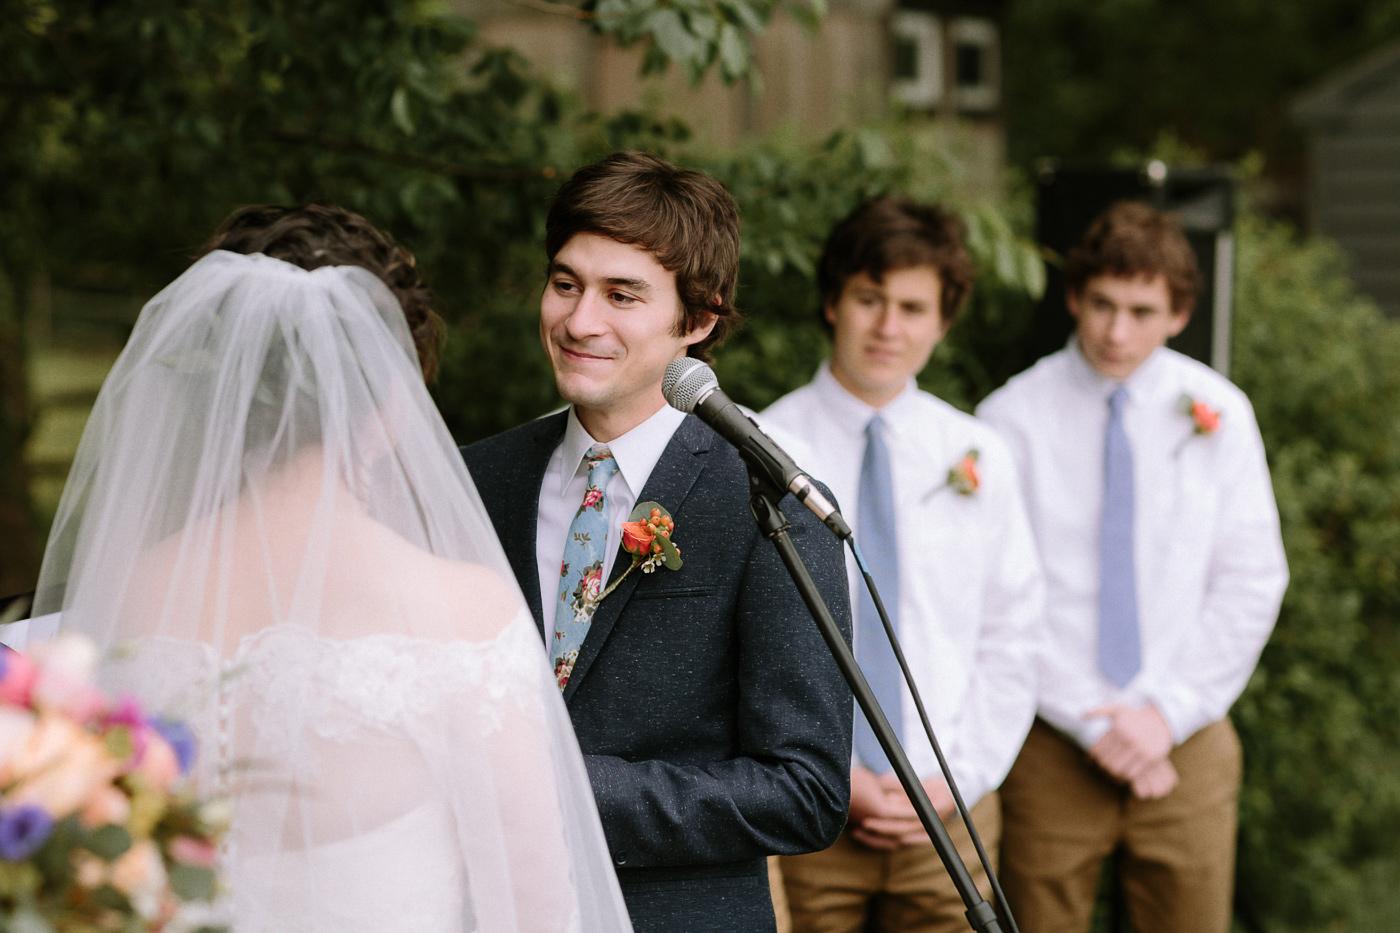 Groom sharing wedding vows